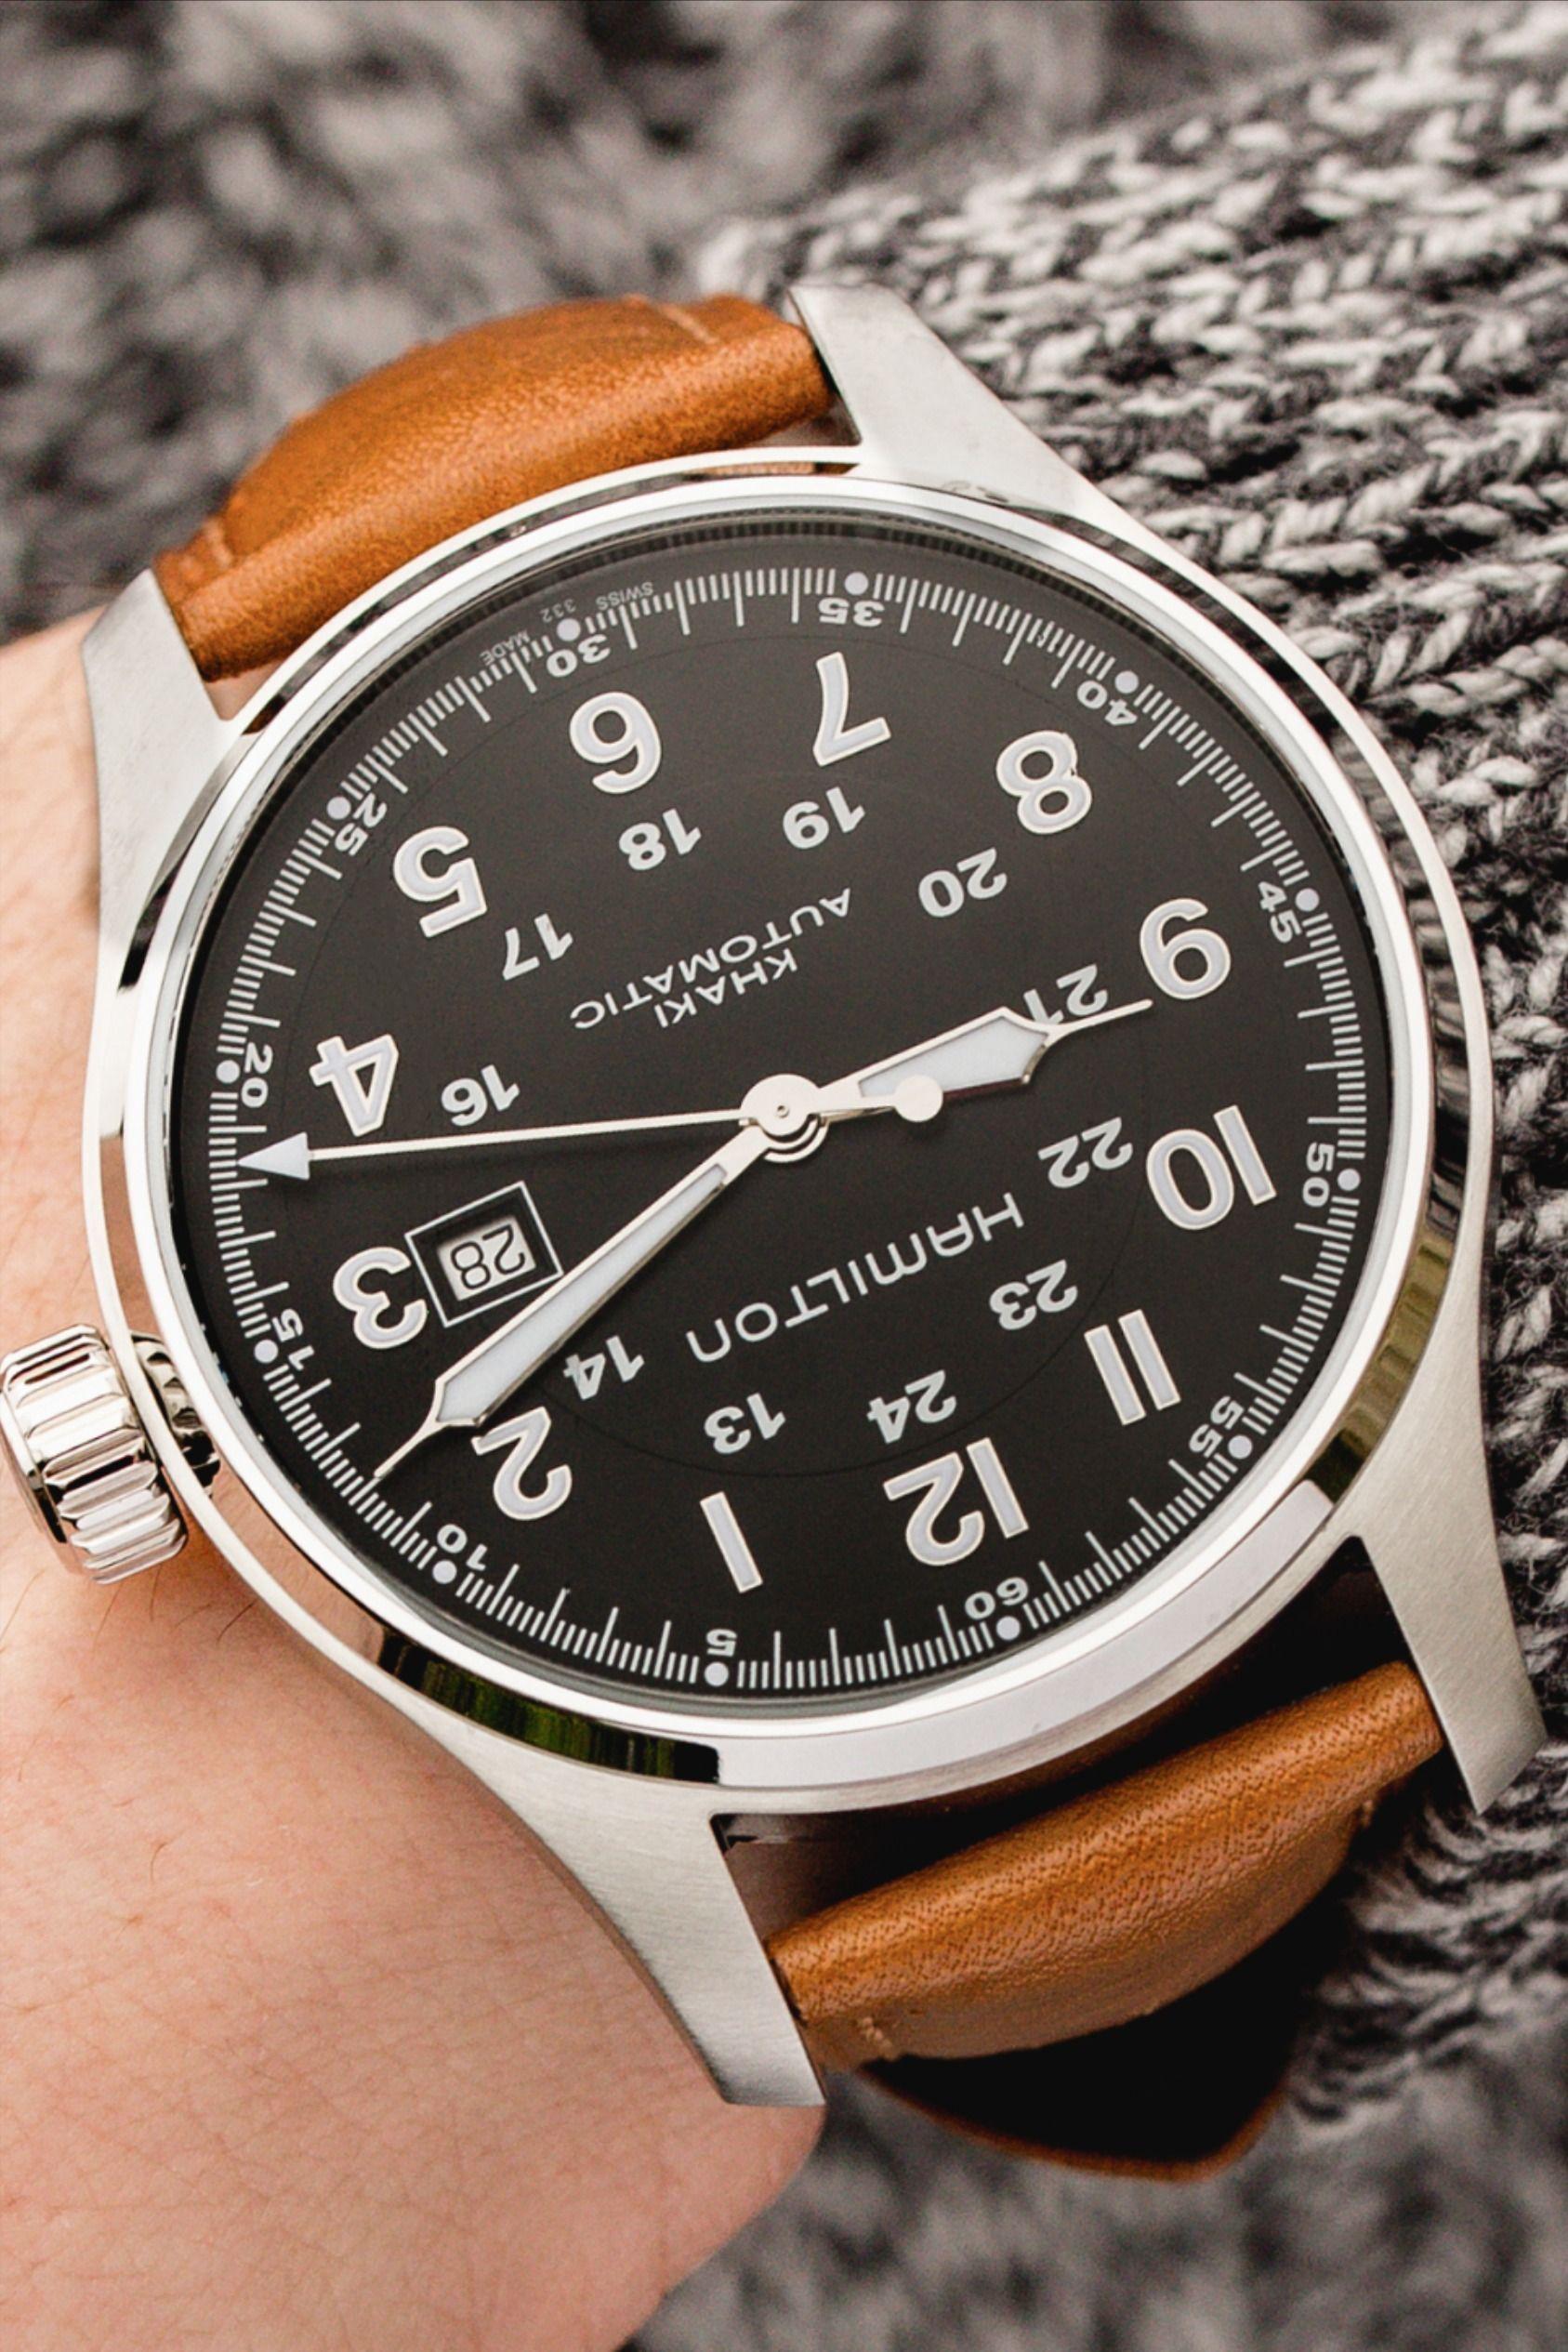 Hirsch camelgrain no allergy leather watch strap in brown